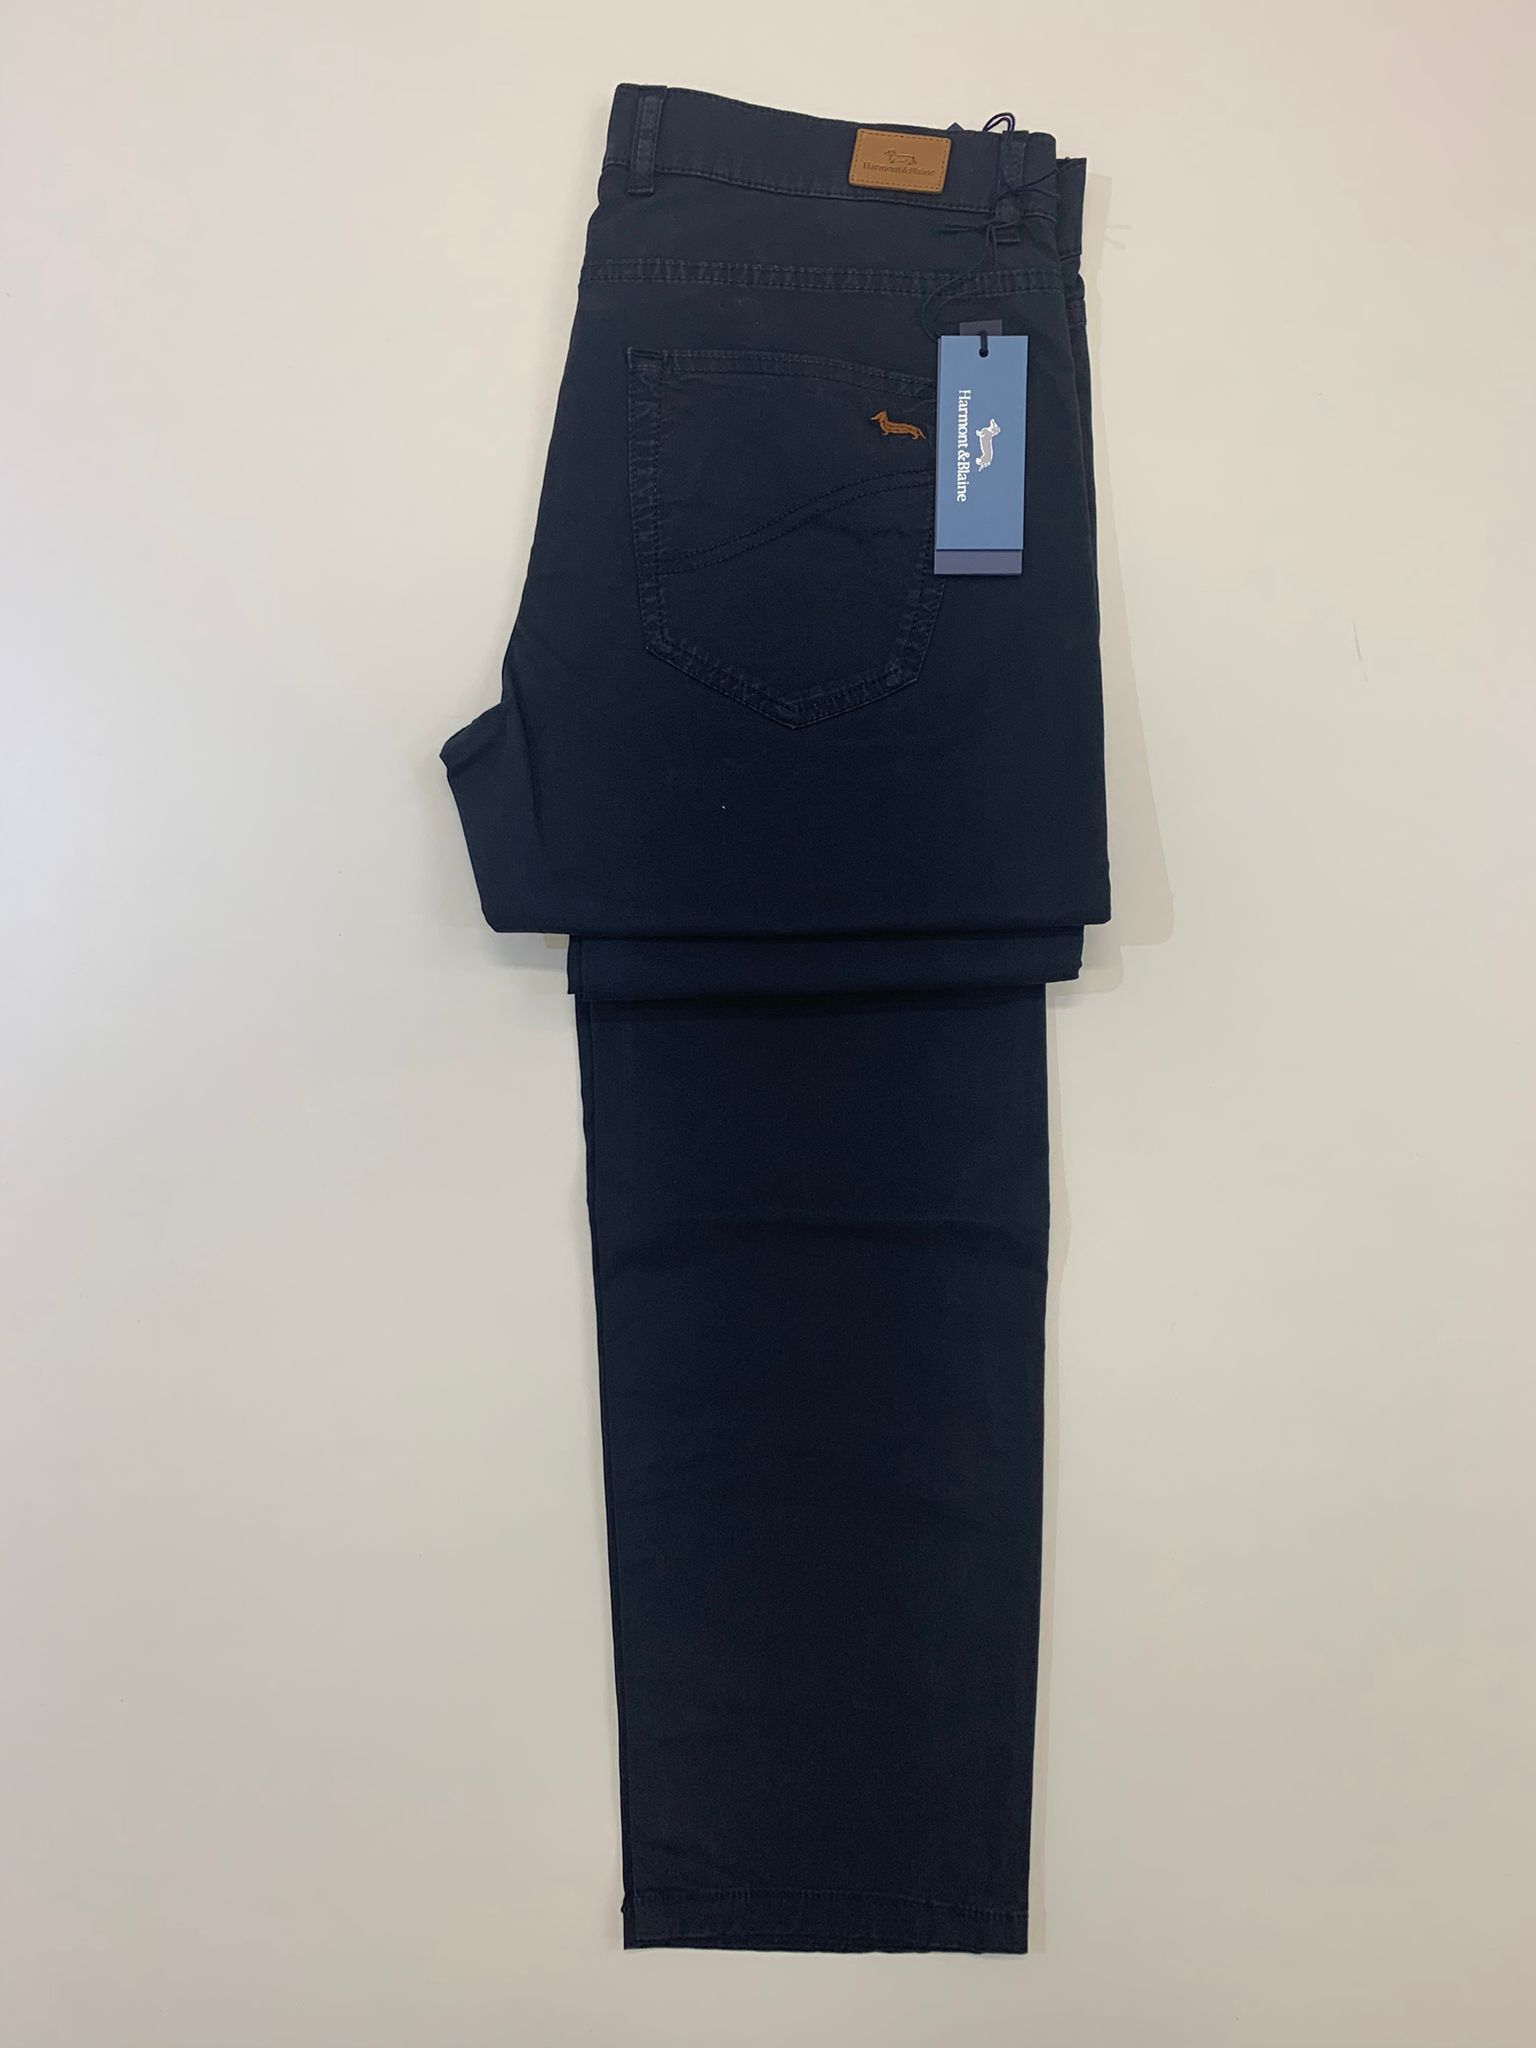 Pantalone Harmont e Blaine Cotone Leggero Blu